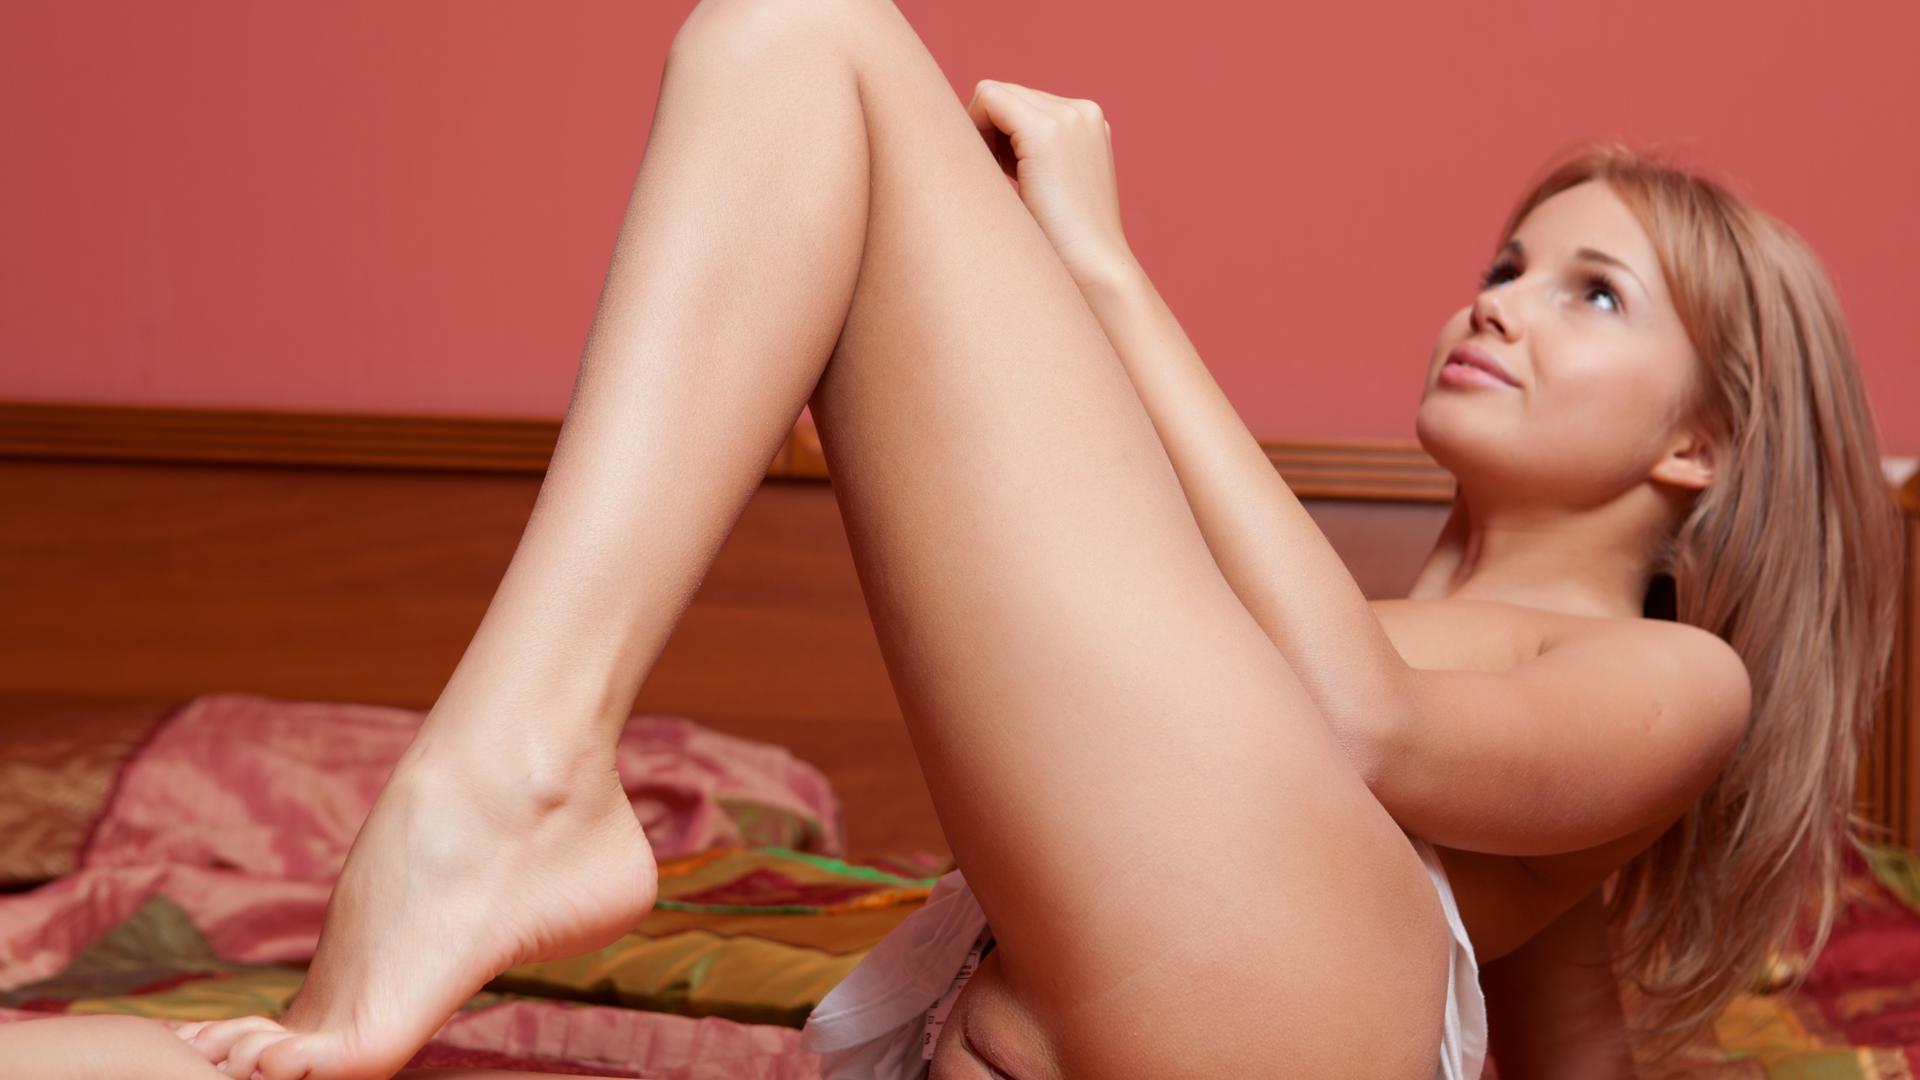 download photo 1920x1080 michaela sexy girl adult model